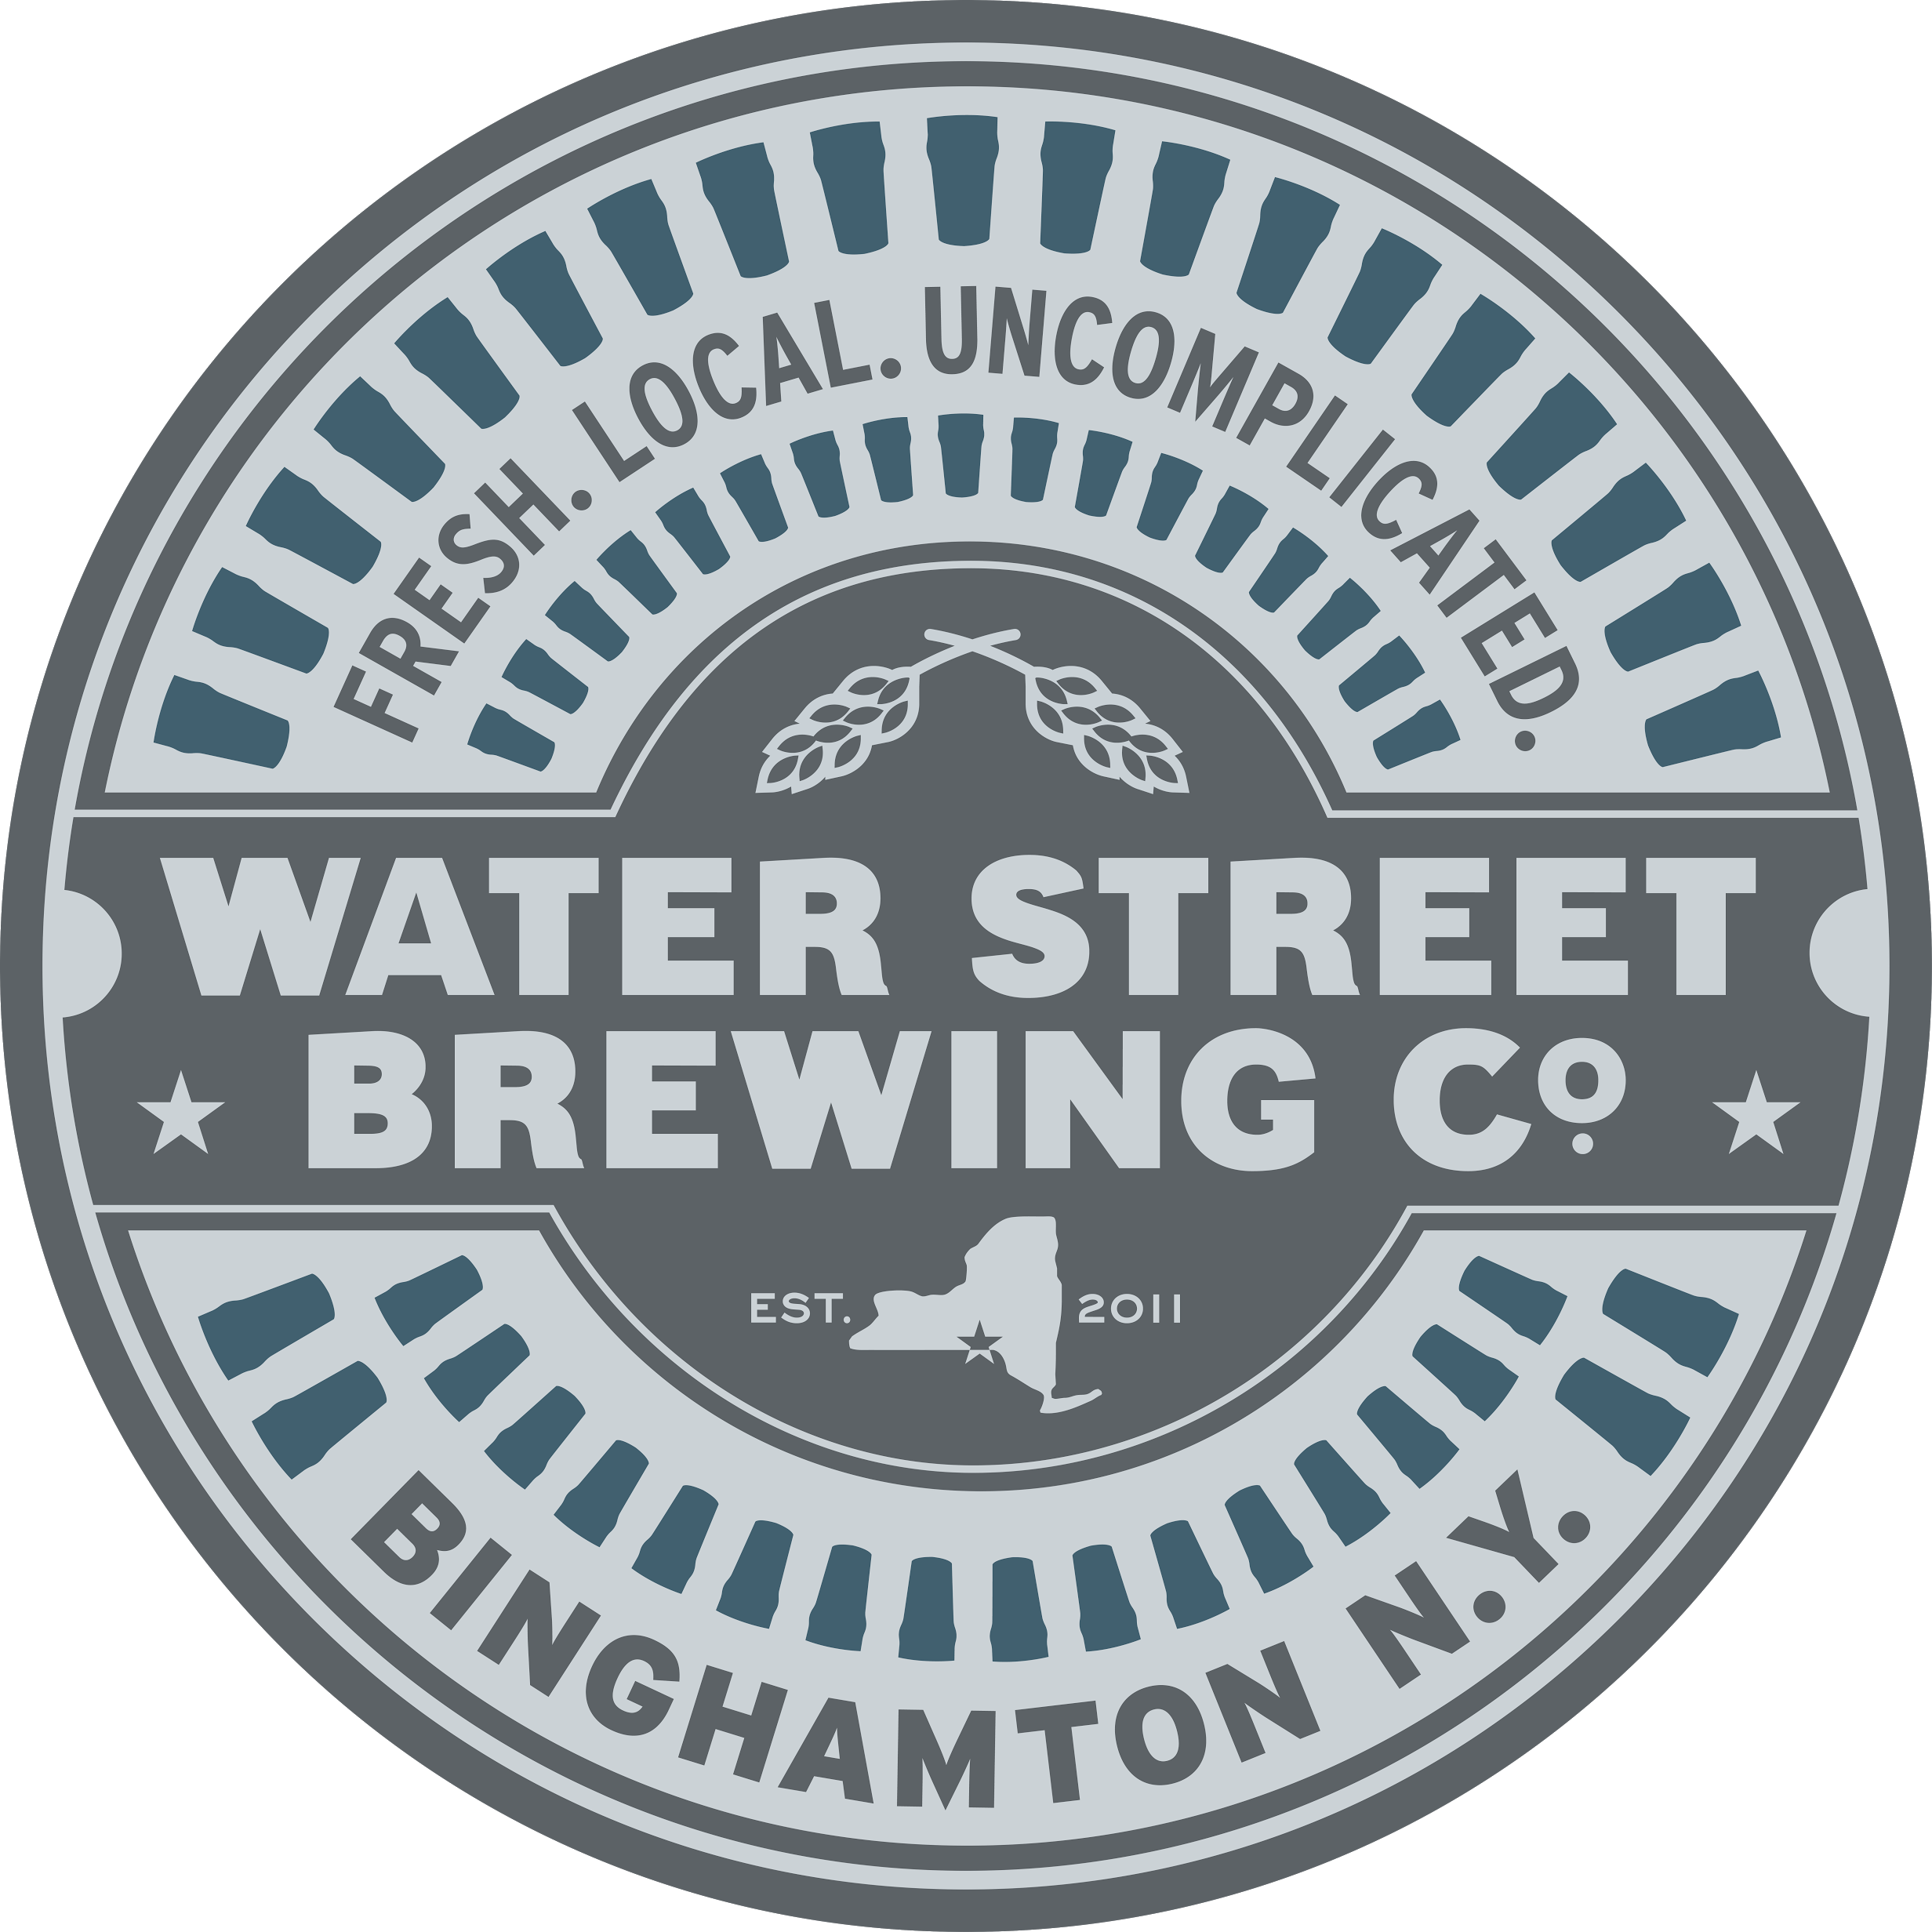 wsbc-1 Water Street Brewing Co.